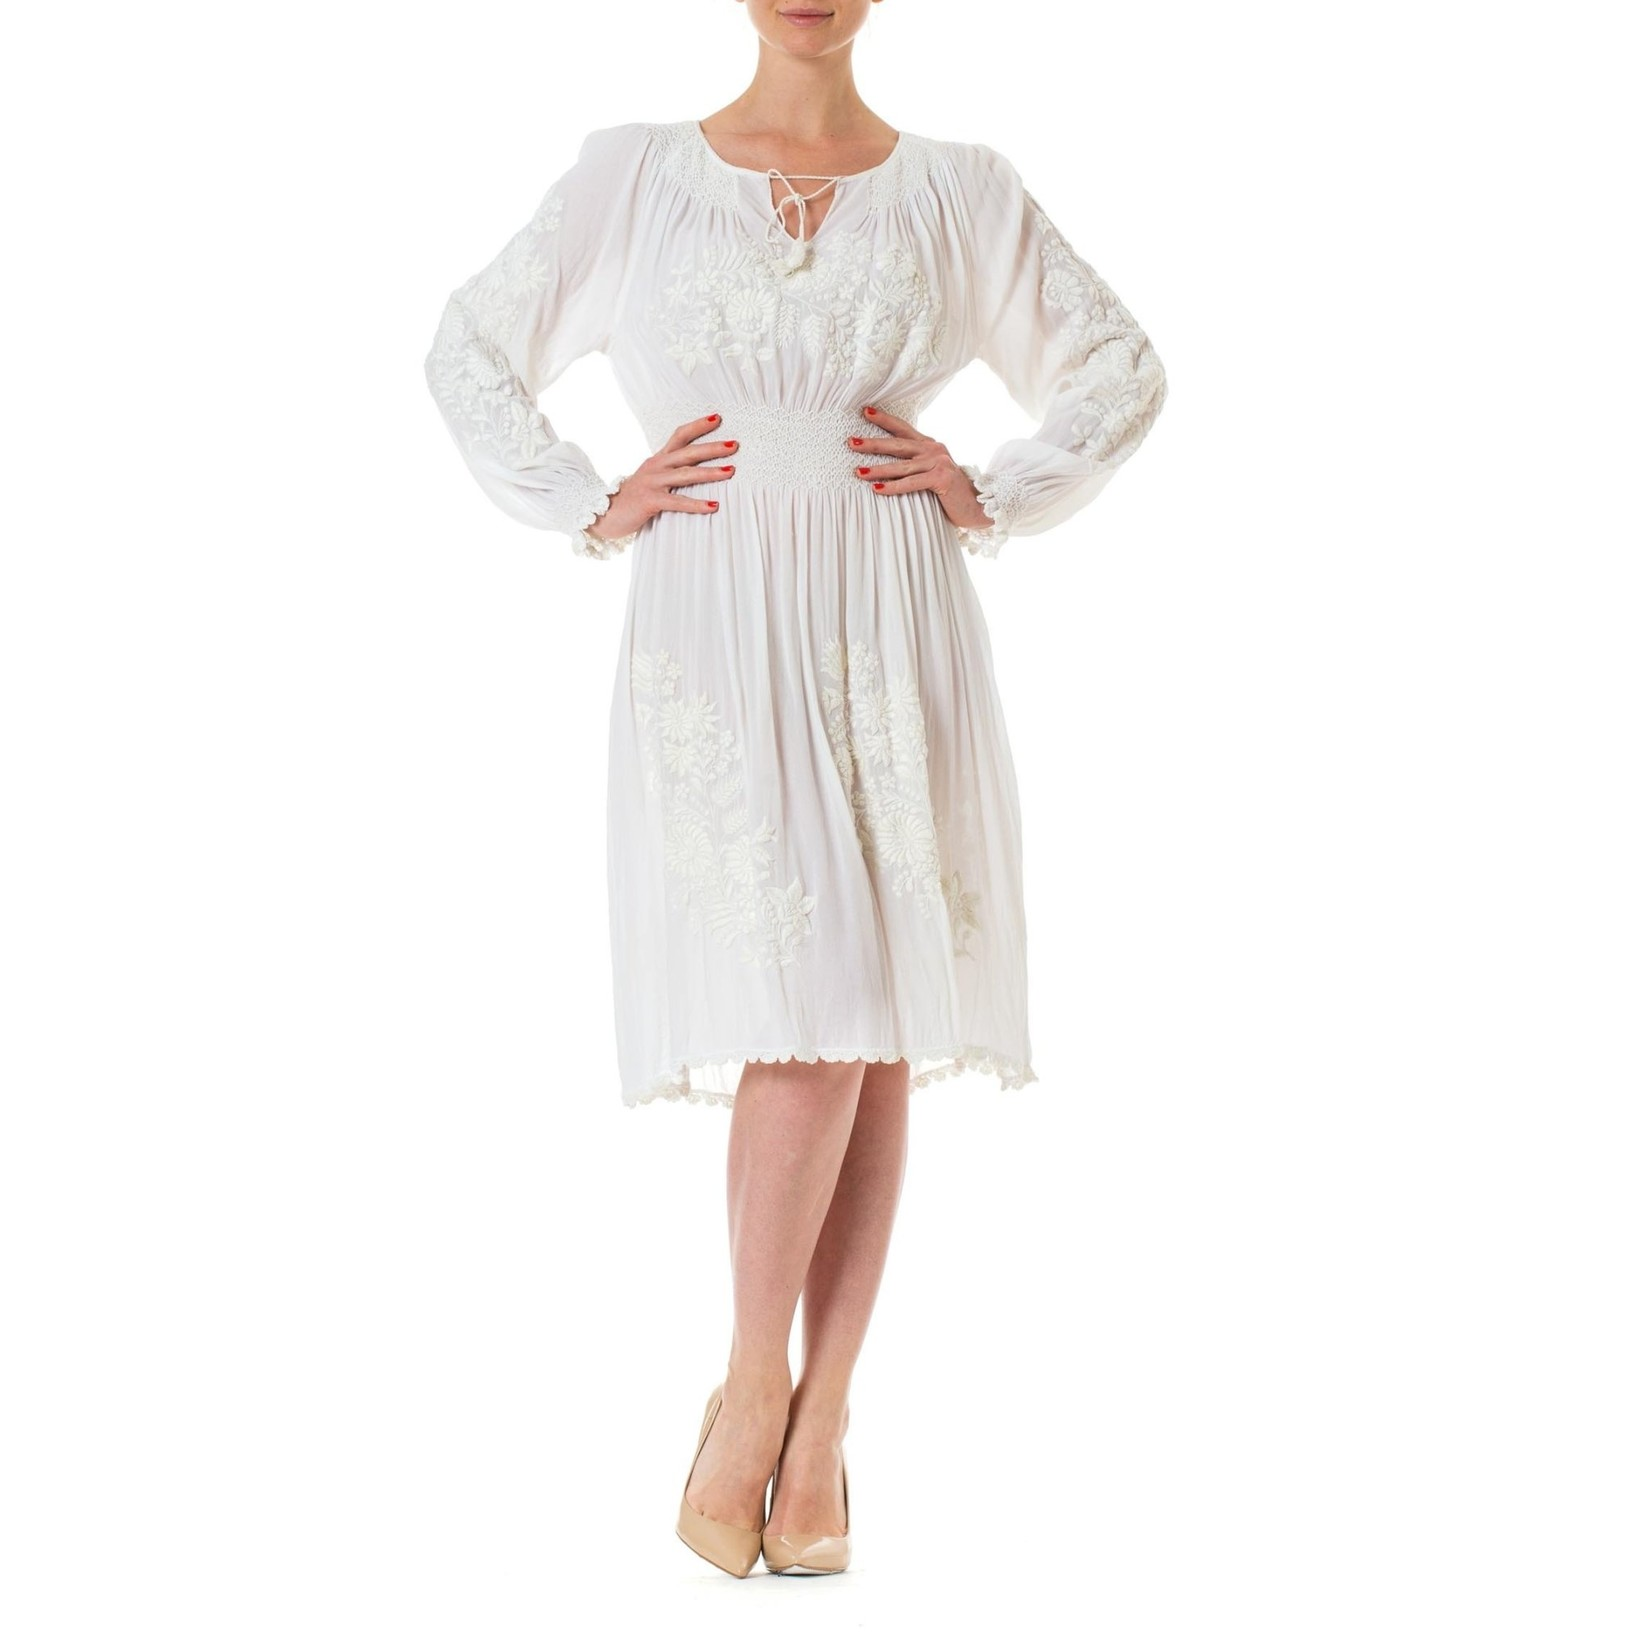 Wyld Blue Vintage 1920s White Rayon Crepe Chiffon Hand Embroidered Long Sleeve Boho Peasant Bridal Dress